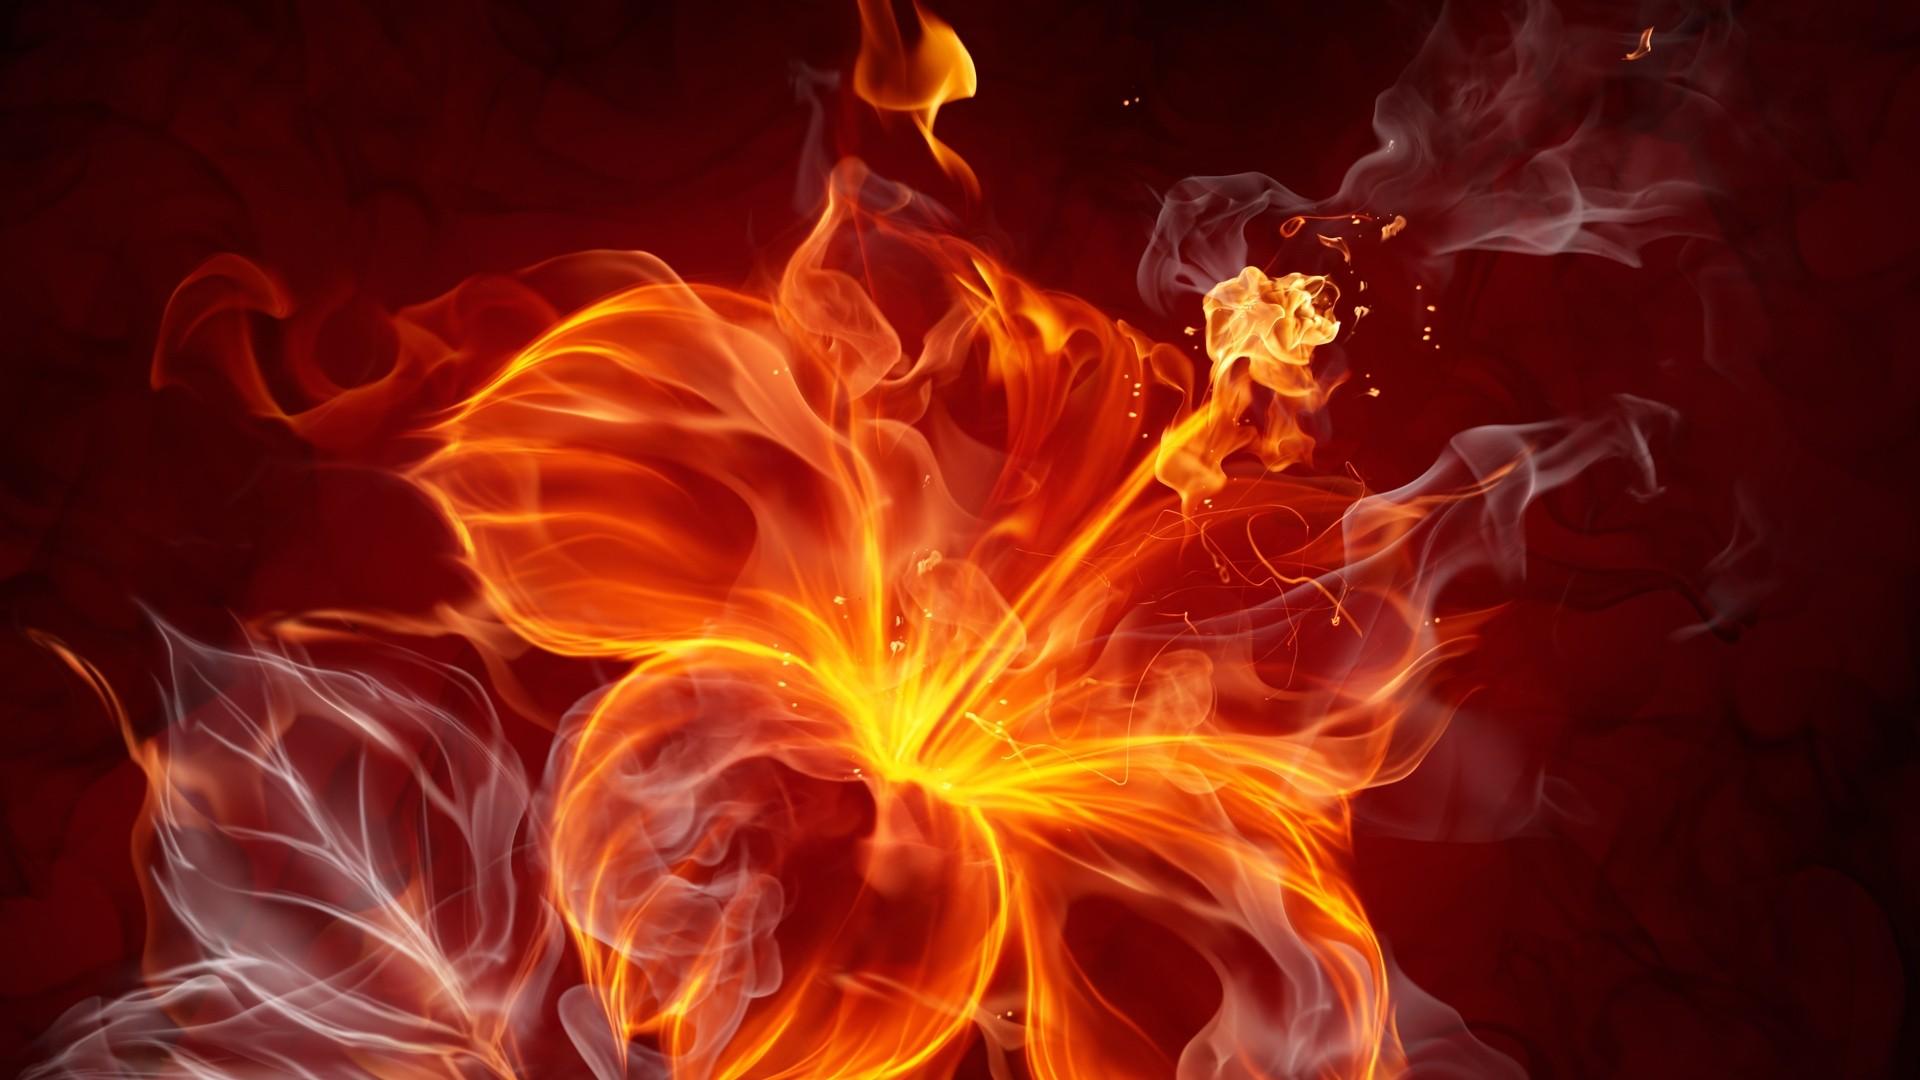 Flame Download Wallpaper